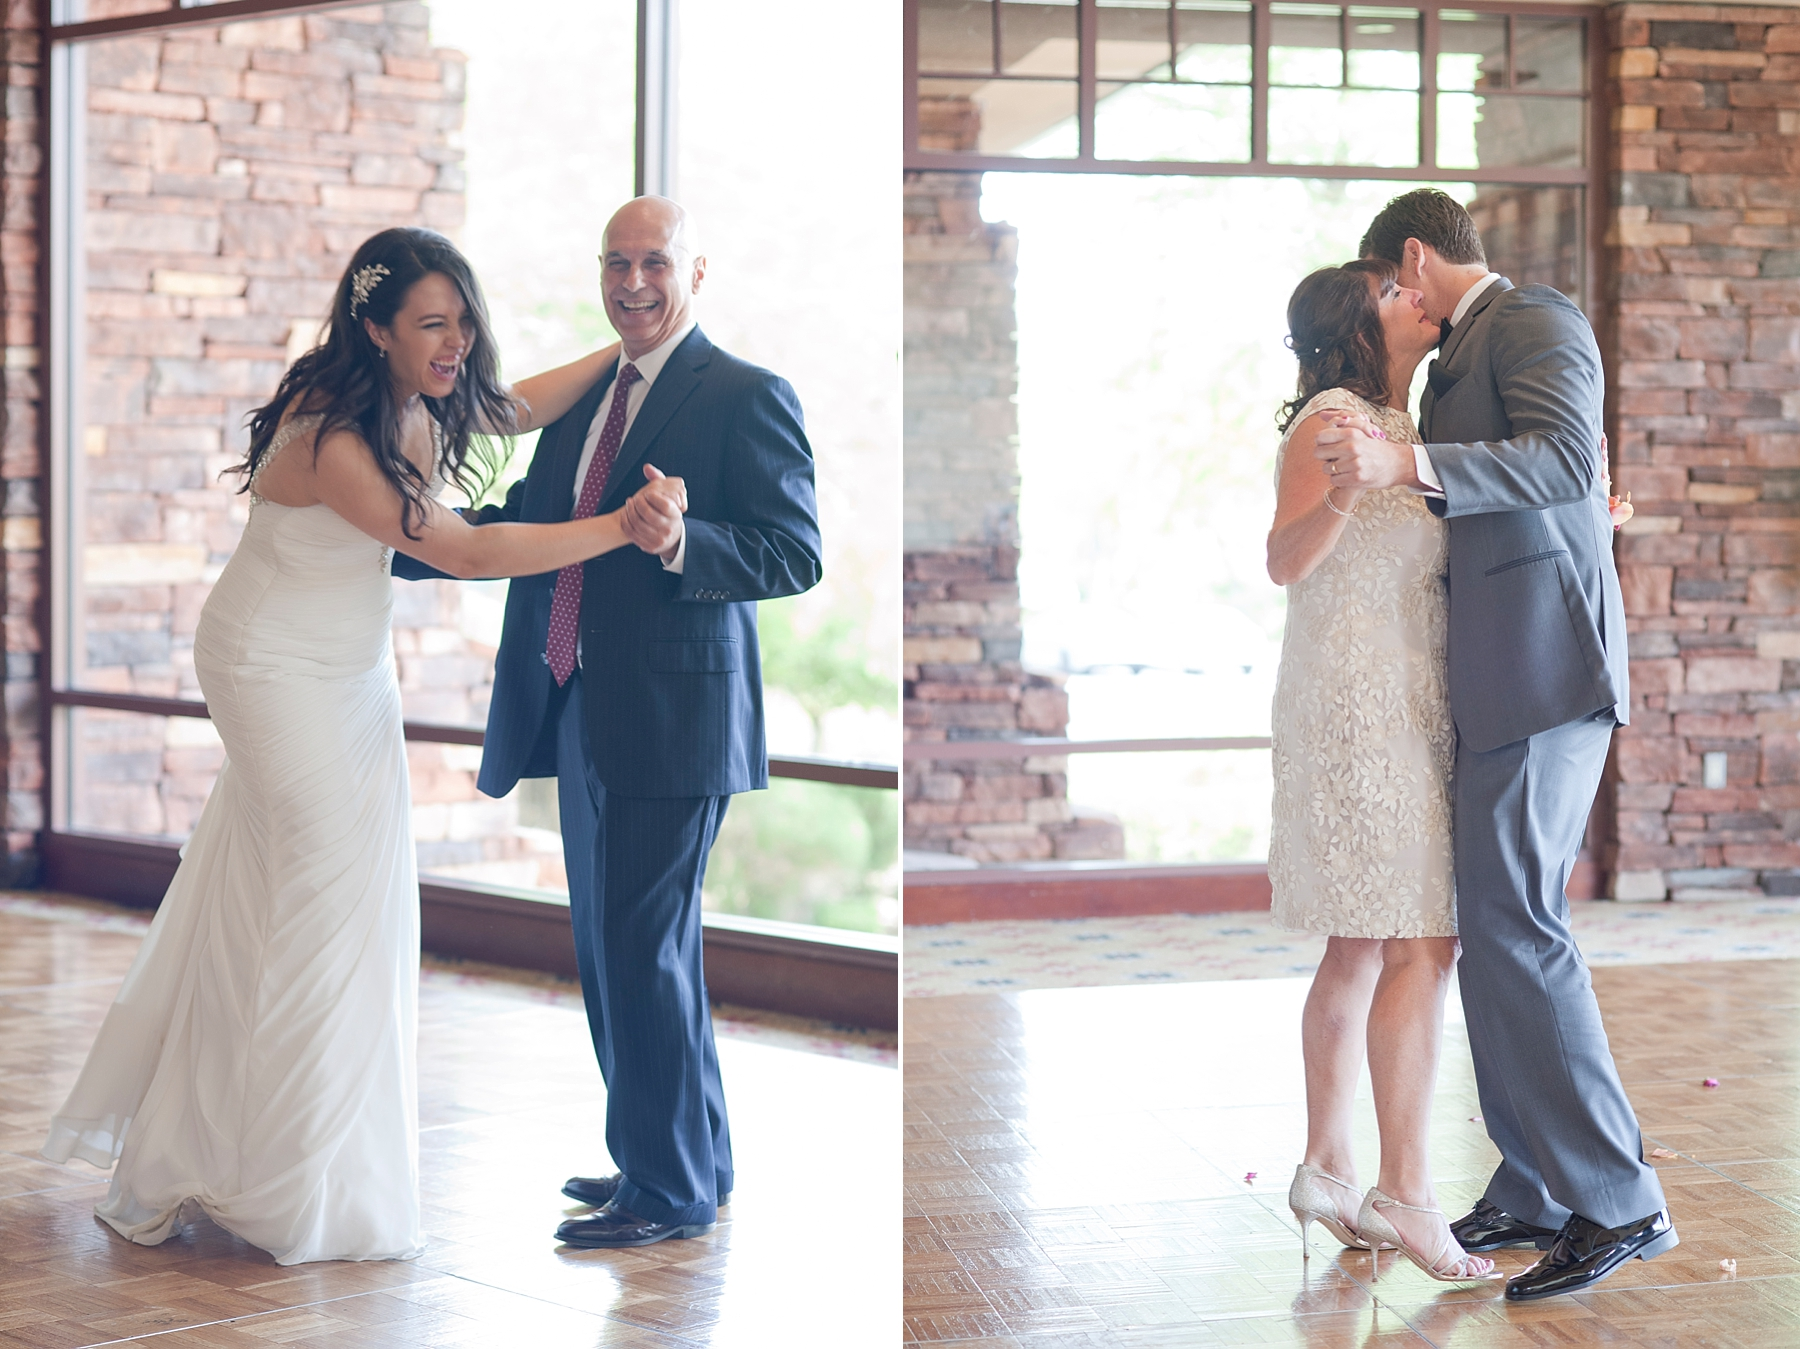 Red_Rock_Country_Club_Las_vegas_destination_wedding-42.jpg